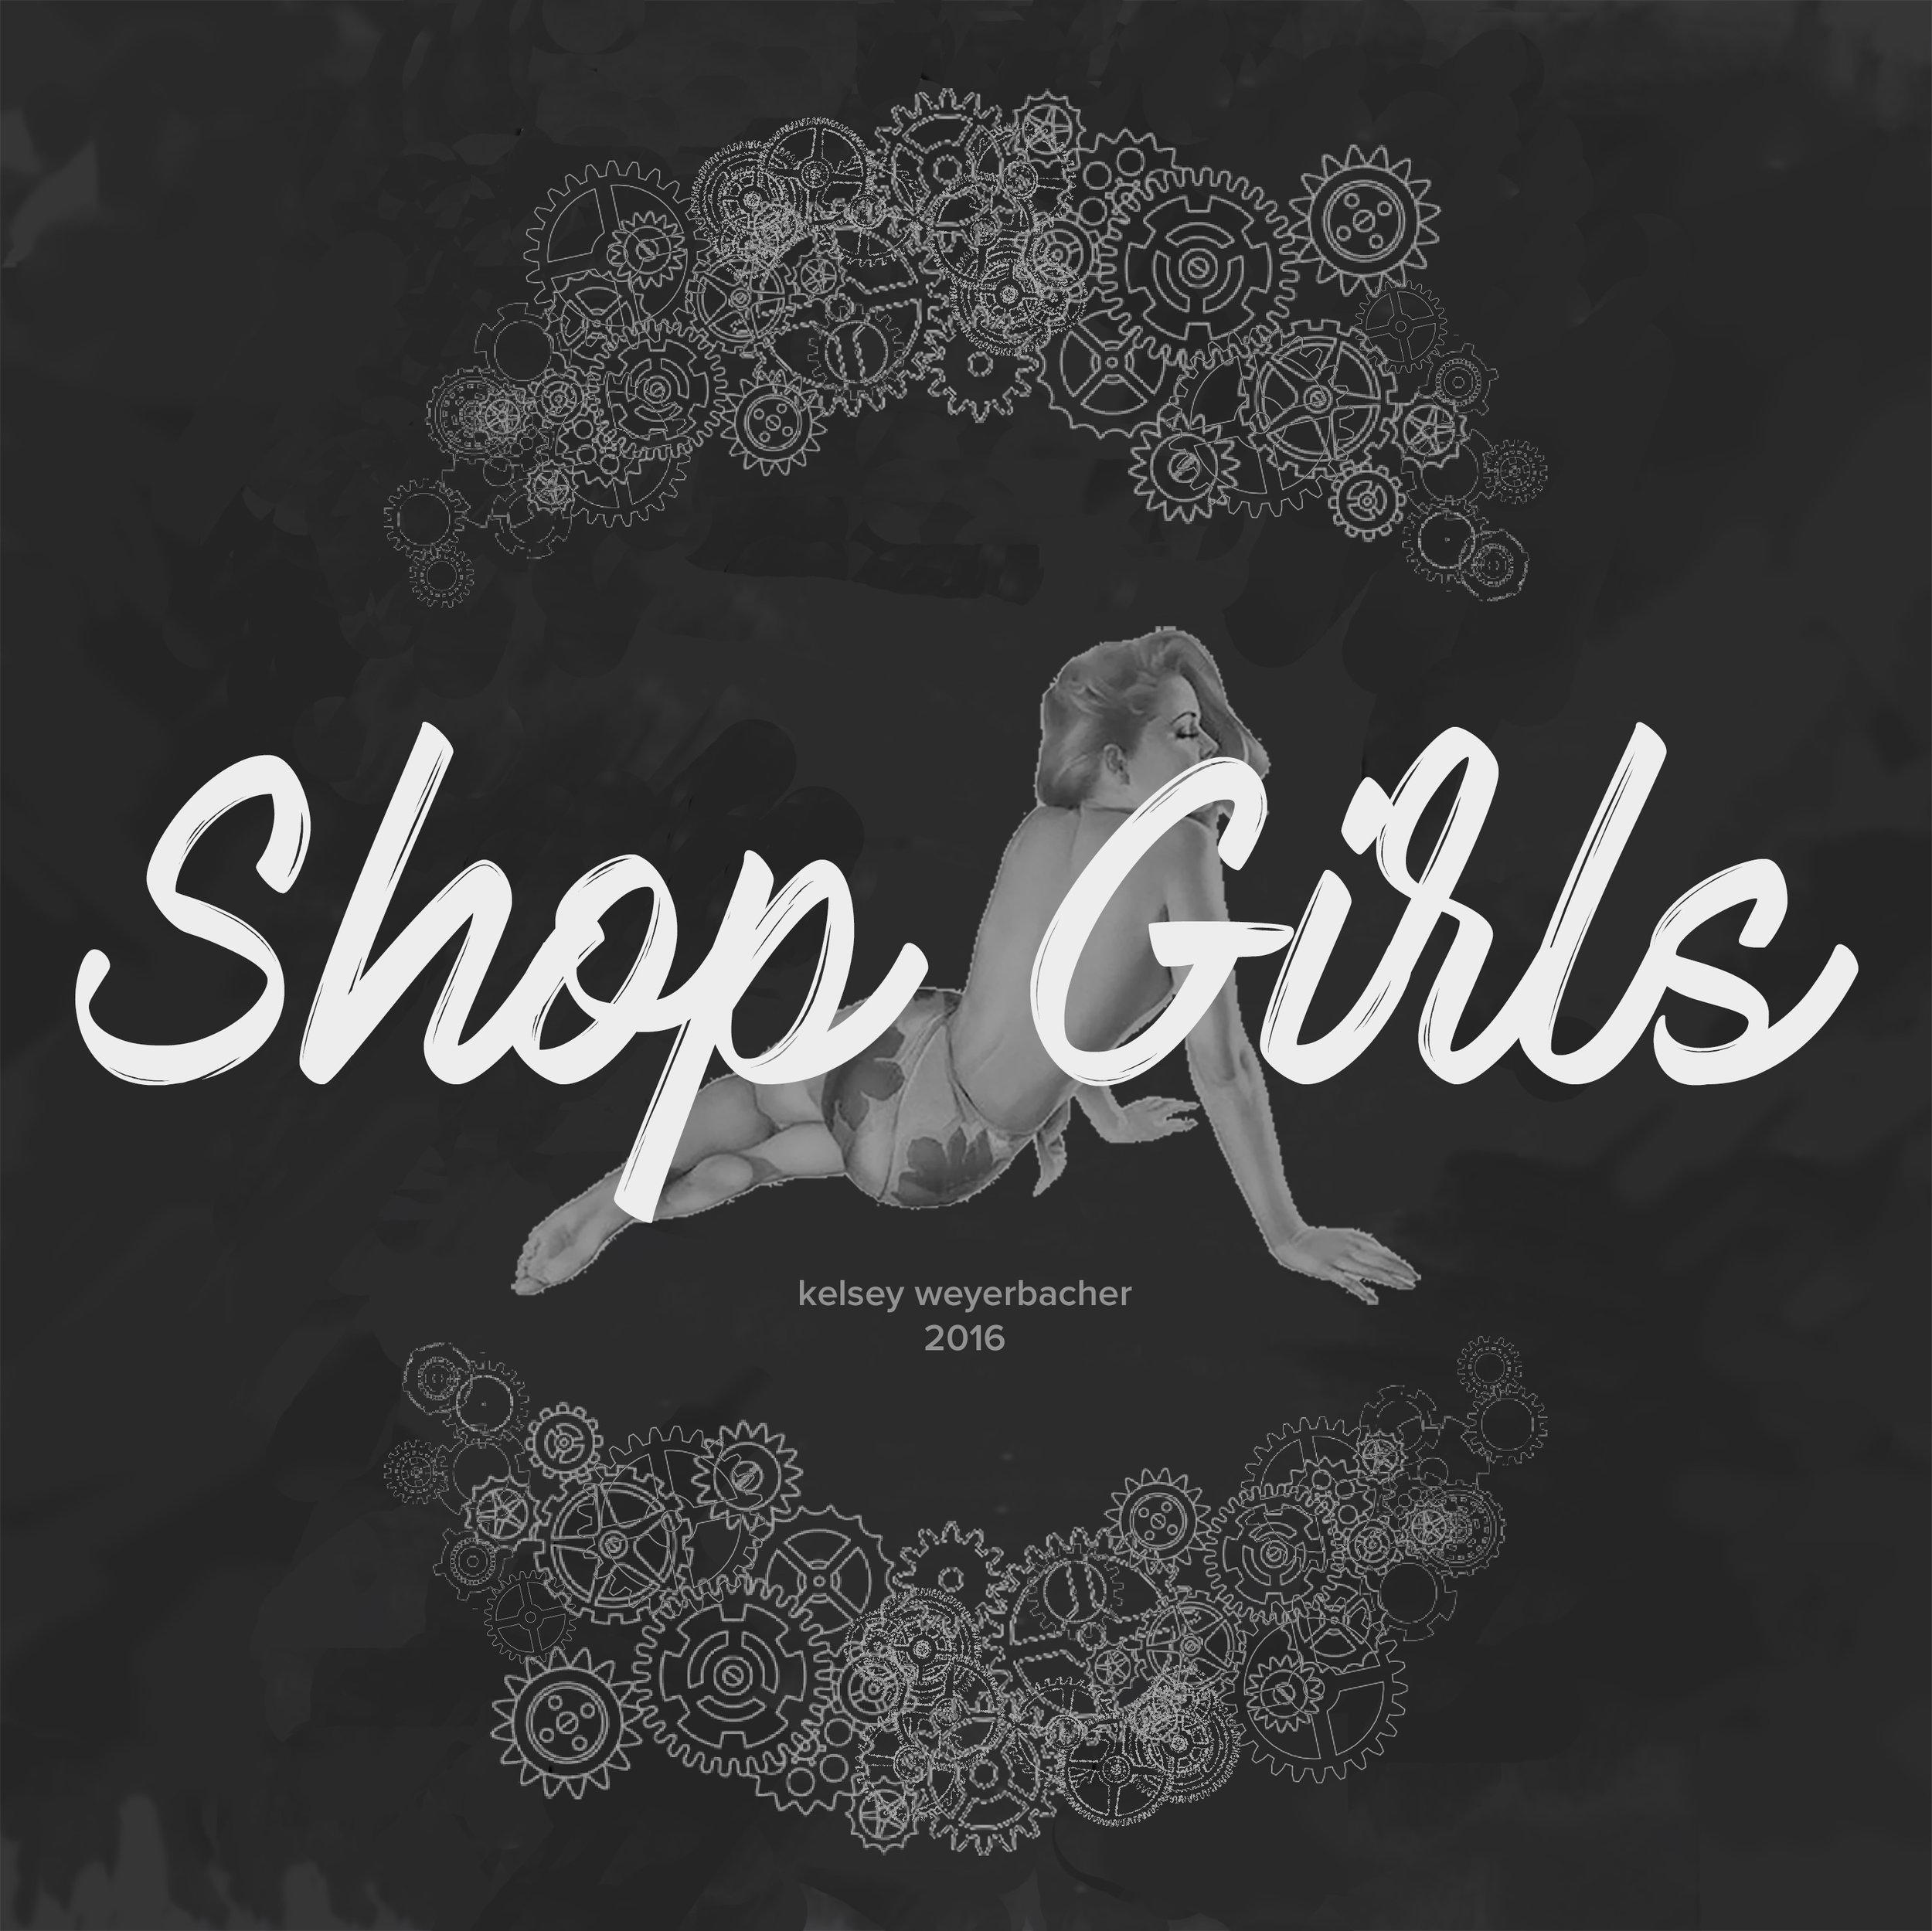 shopgirlstitle.jpg